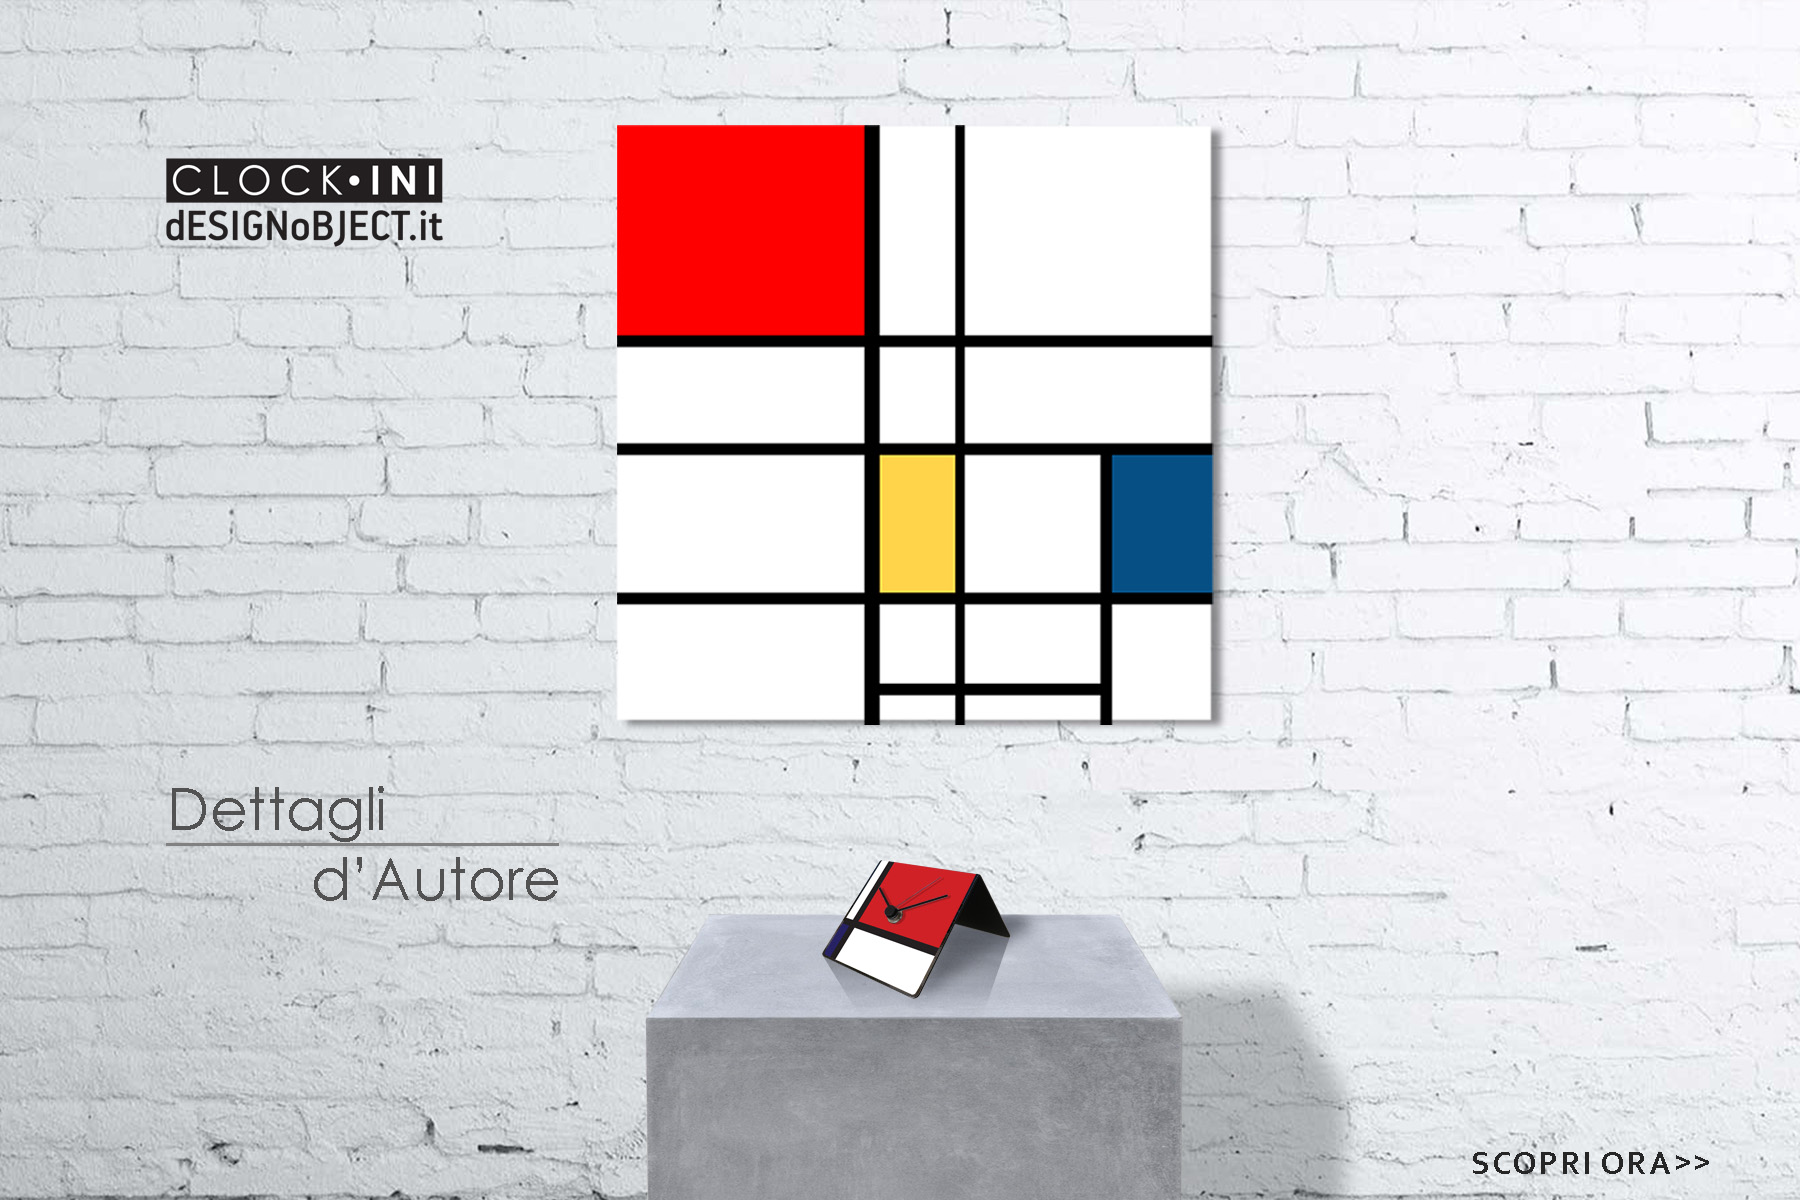 orologio-design-arte-clockini-designobject